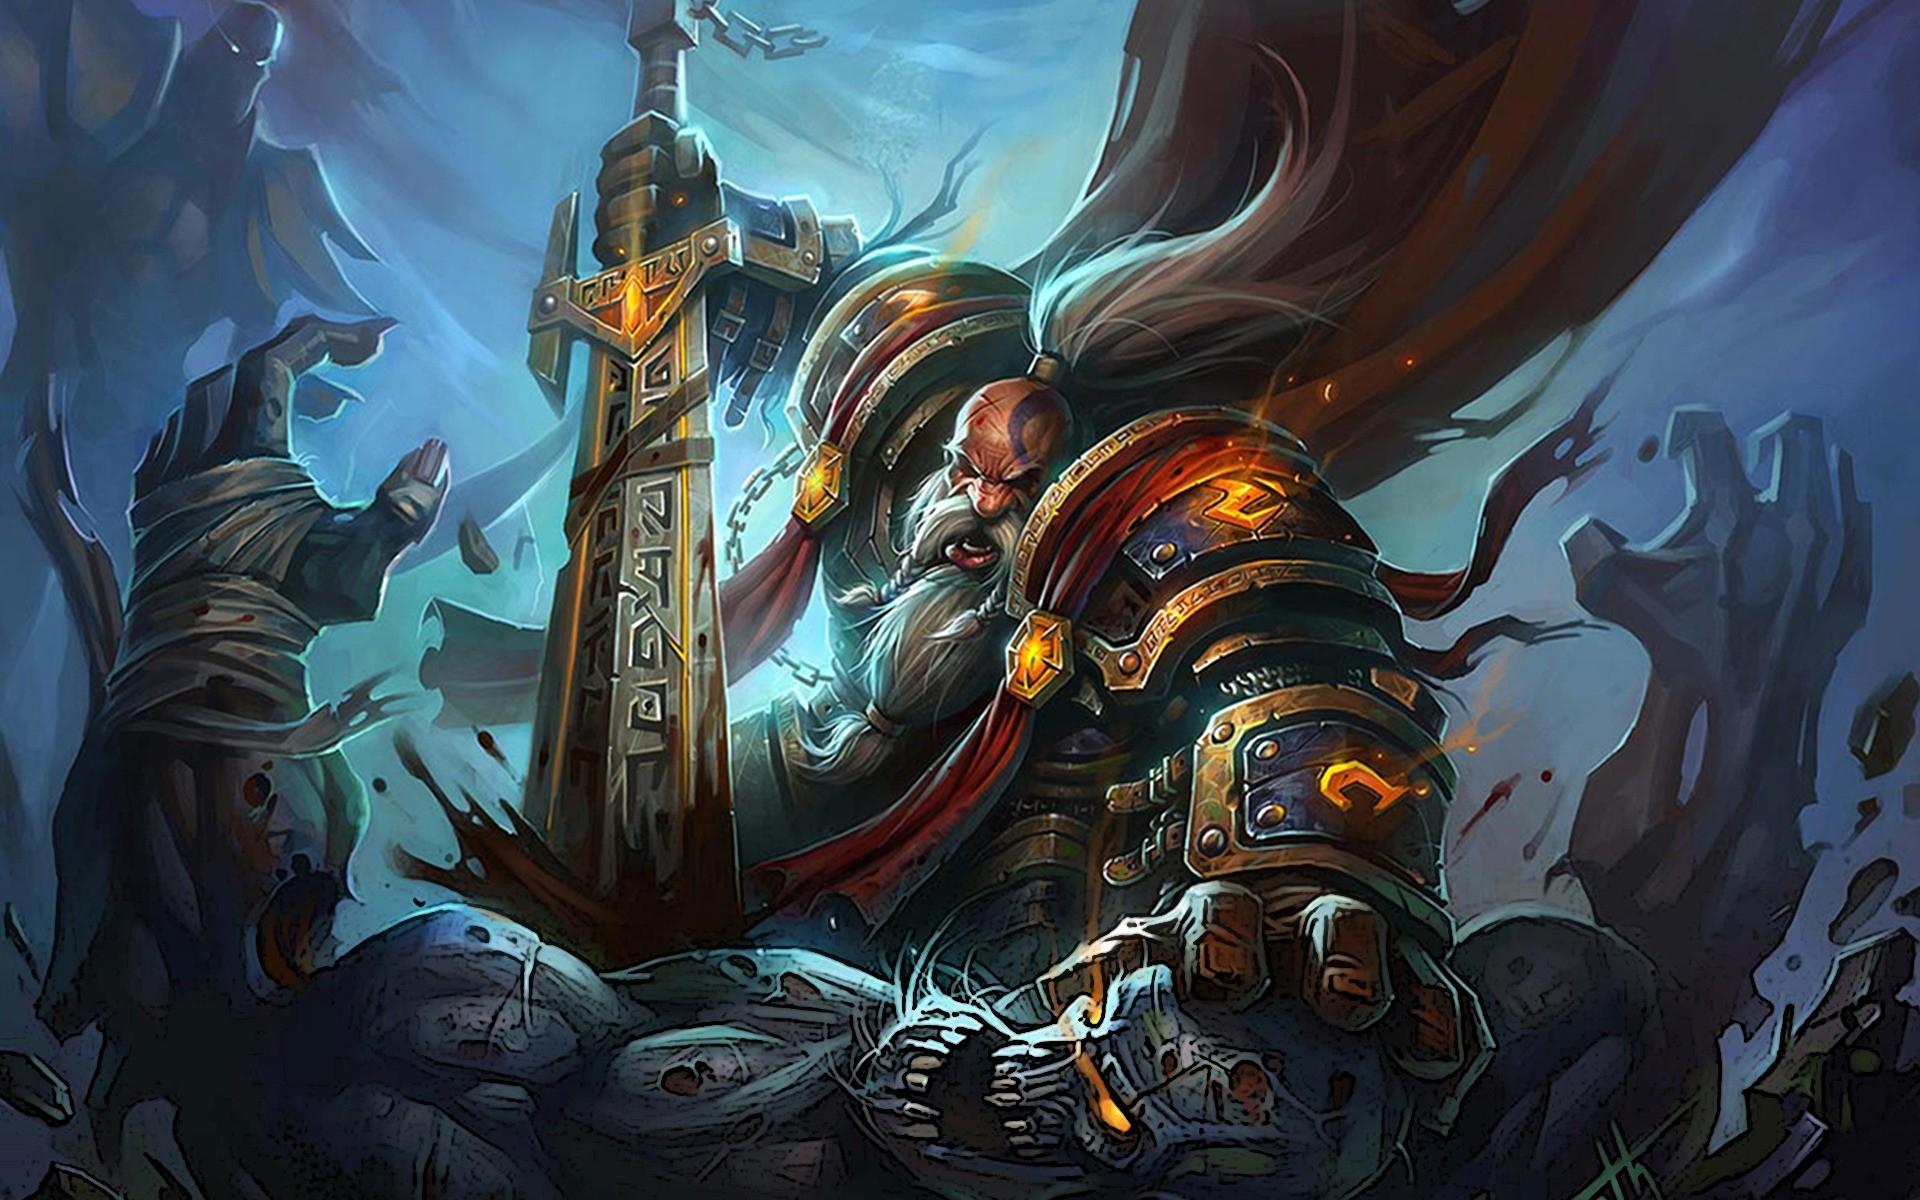 World of warcraft | wowwiki | fandom